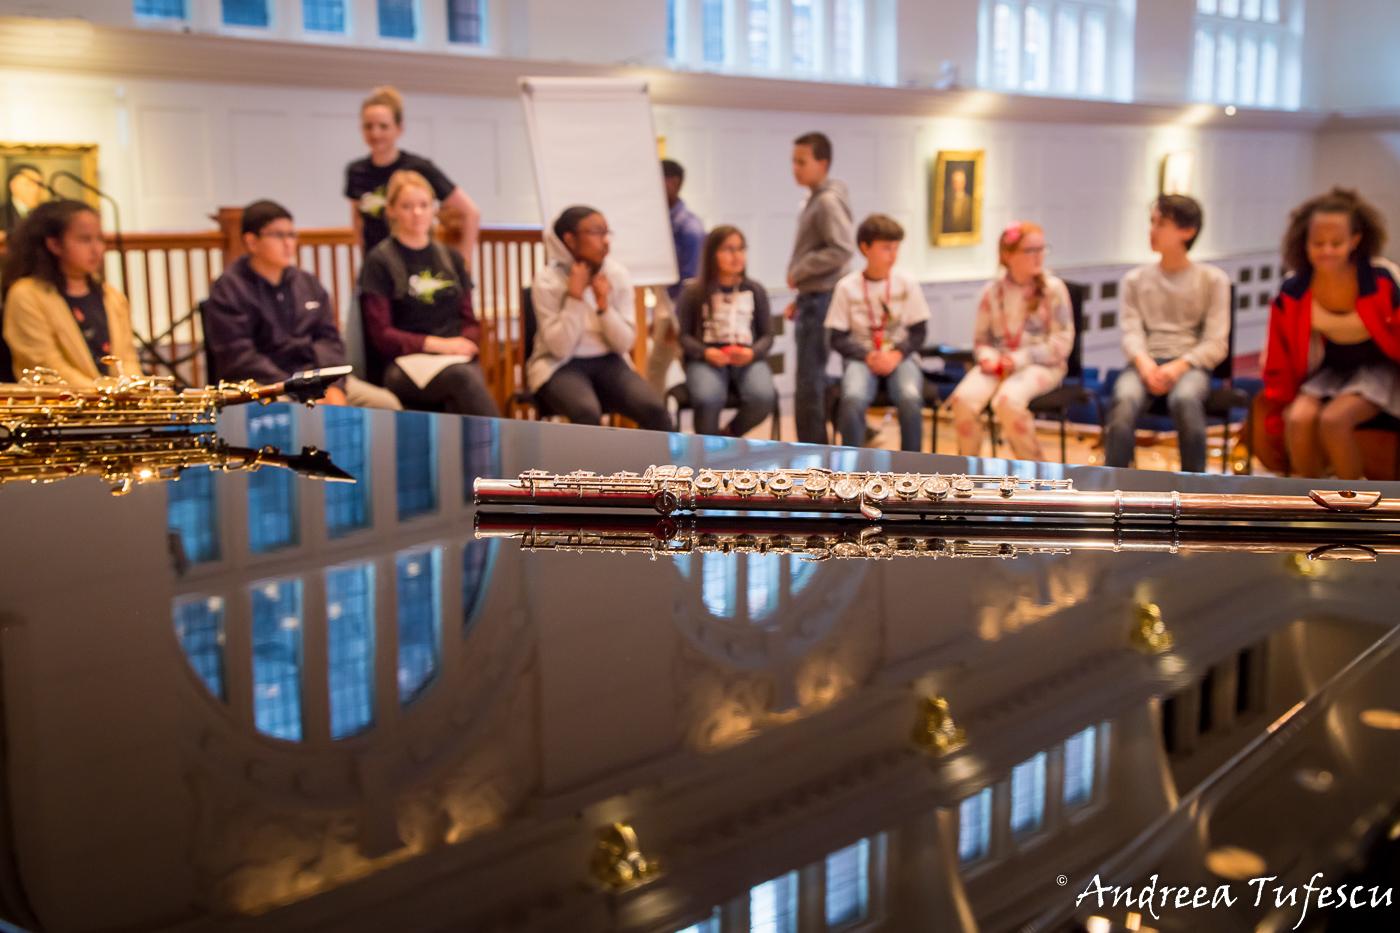 RCM Sparks workshop Sept 2016  by London photographer Andreea Tufescu